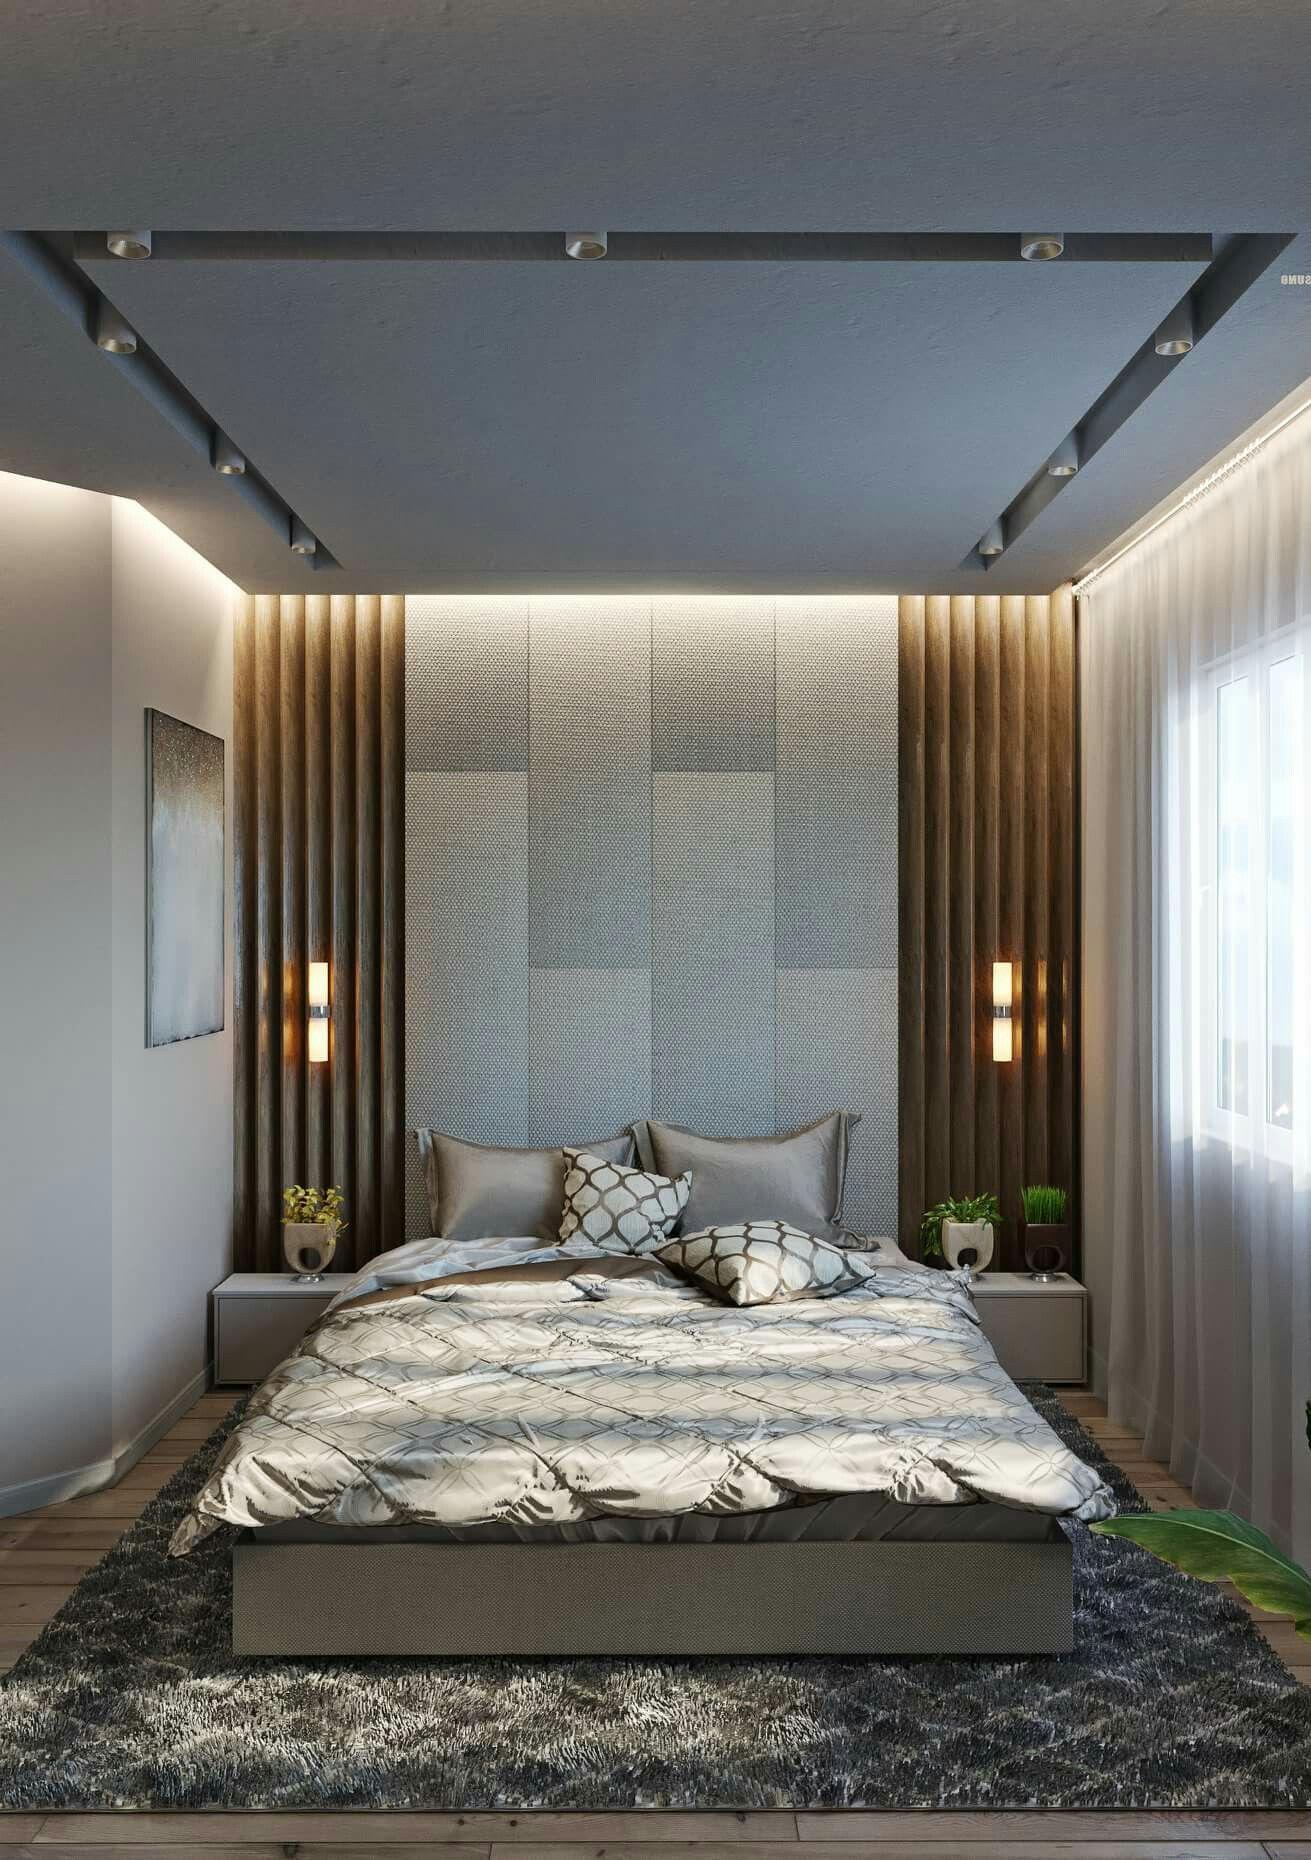 Minimalist Hotel Room: Pin De Anita Khan En Life With Styles